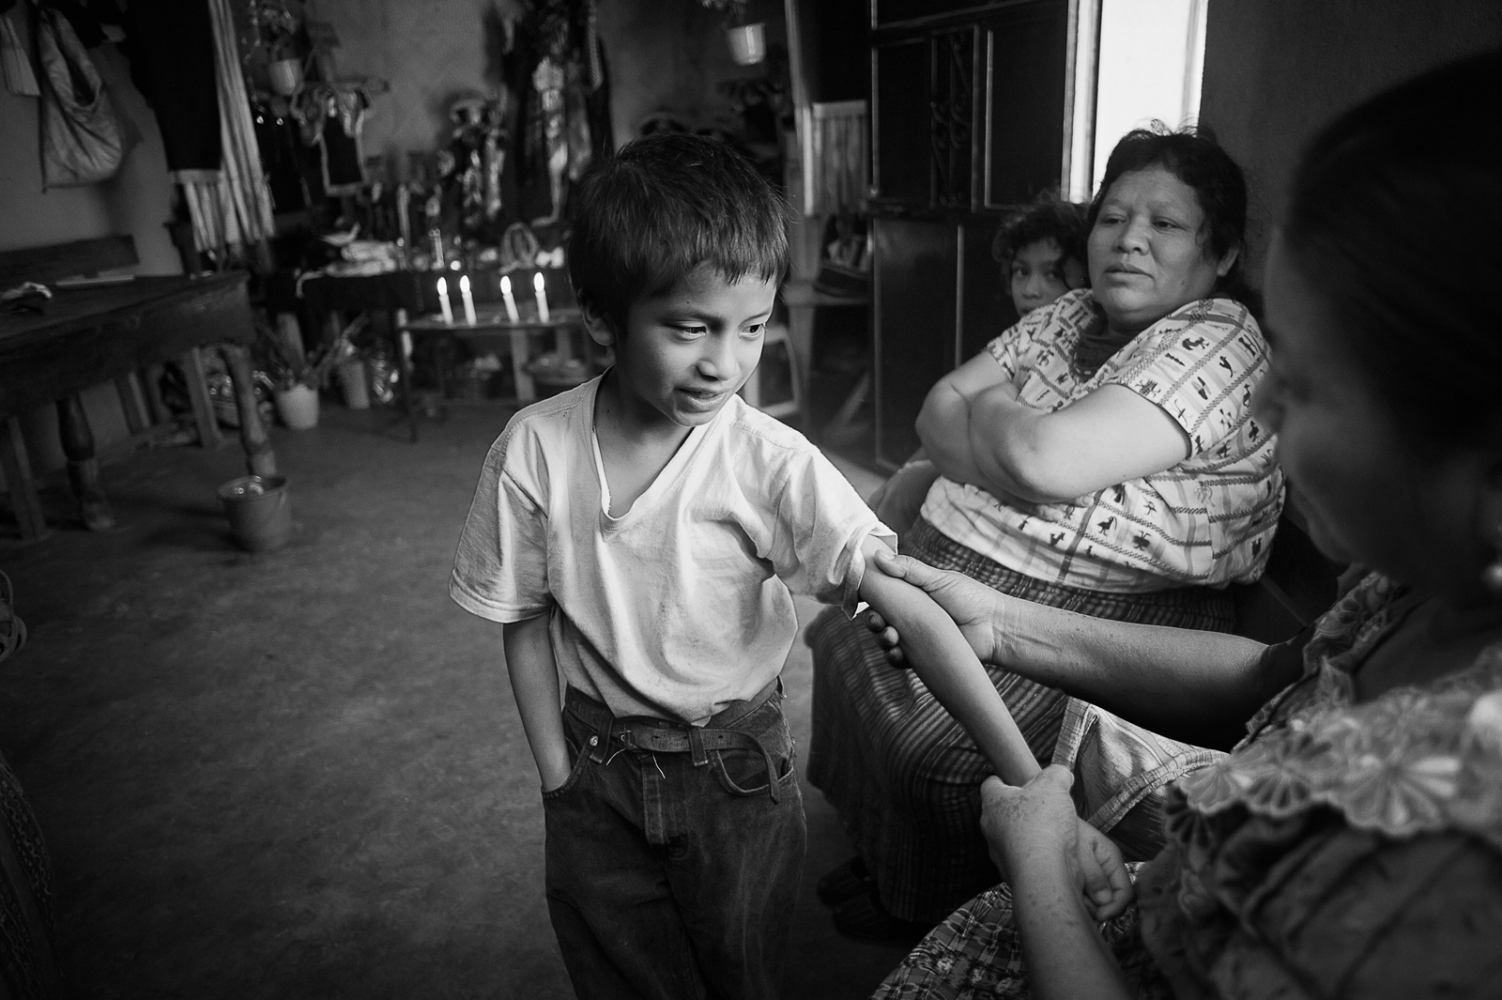 Berta Navichoc, bonesetter, treating a young boy with a broken arm